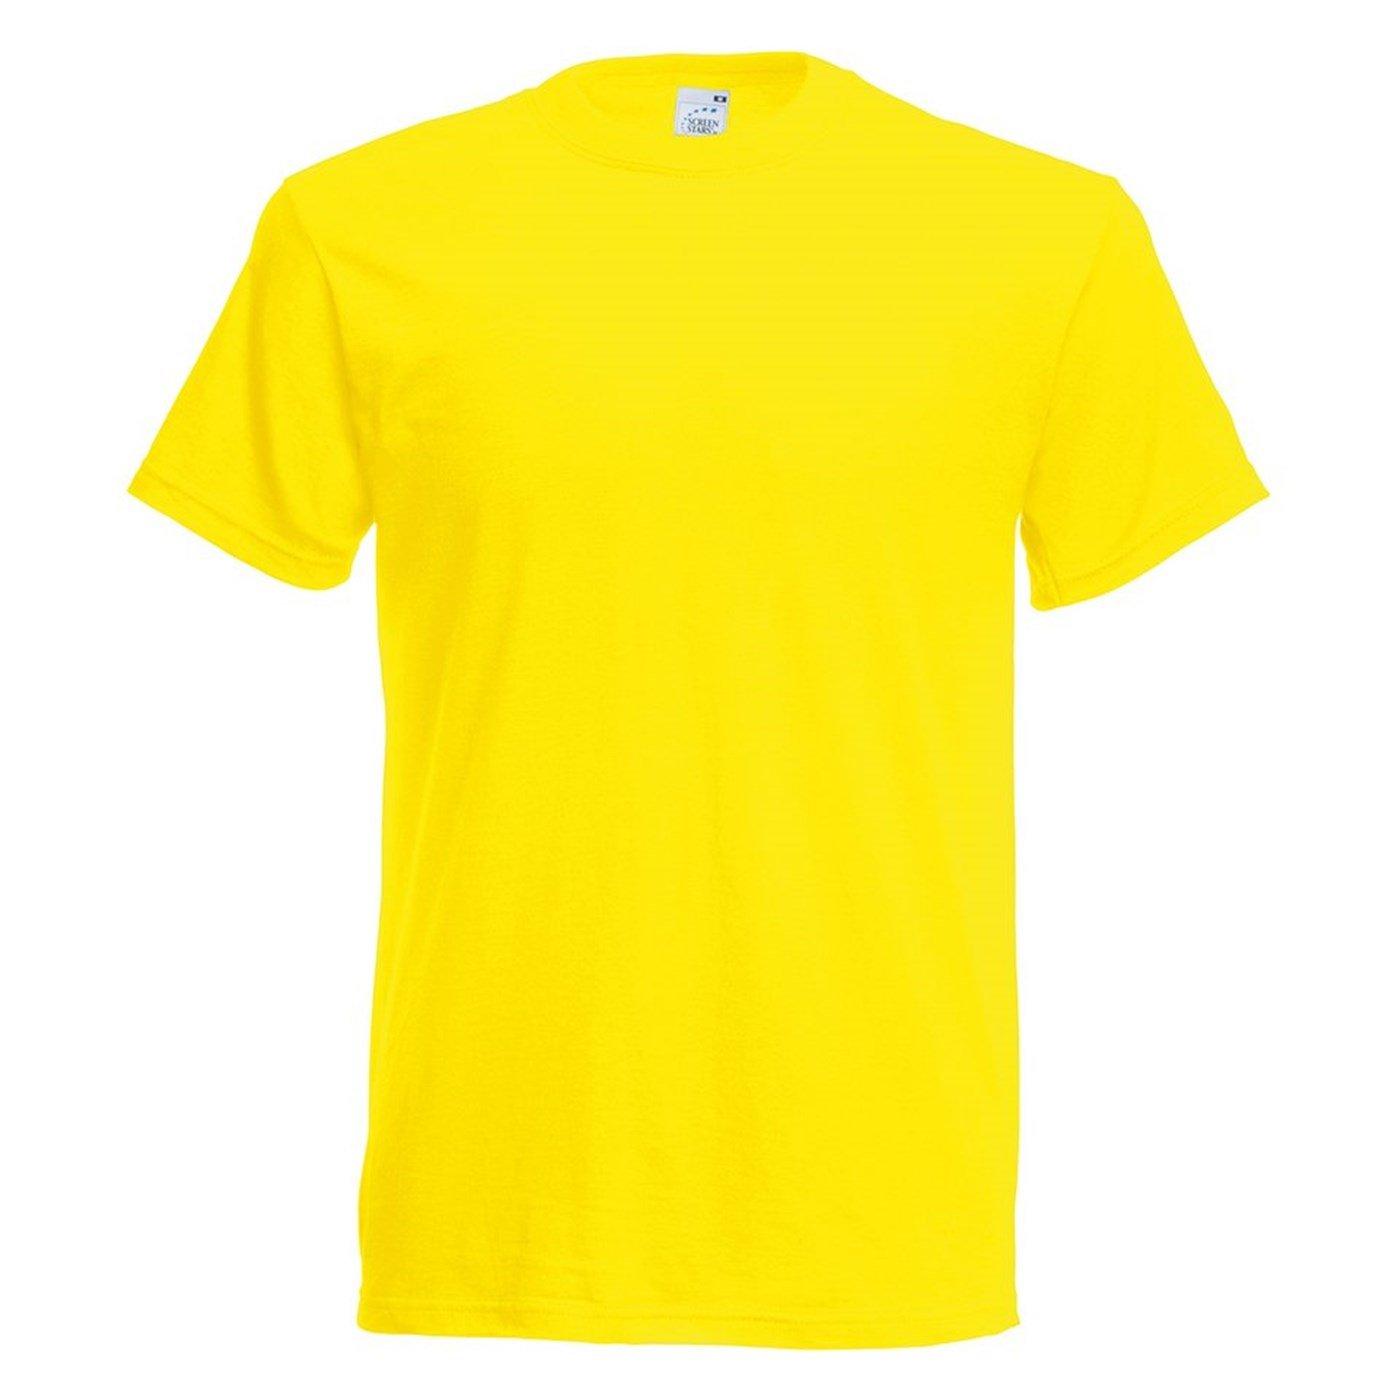 f68c03db6ec Fruit of the Loom Adult s Original Full Cut T-Shirt SS048